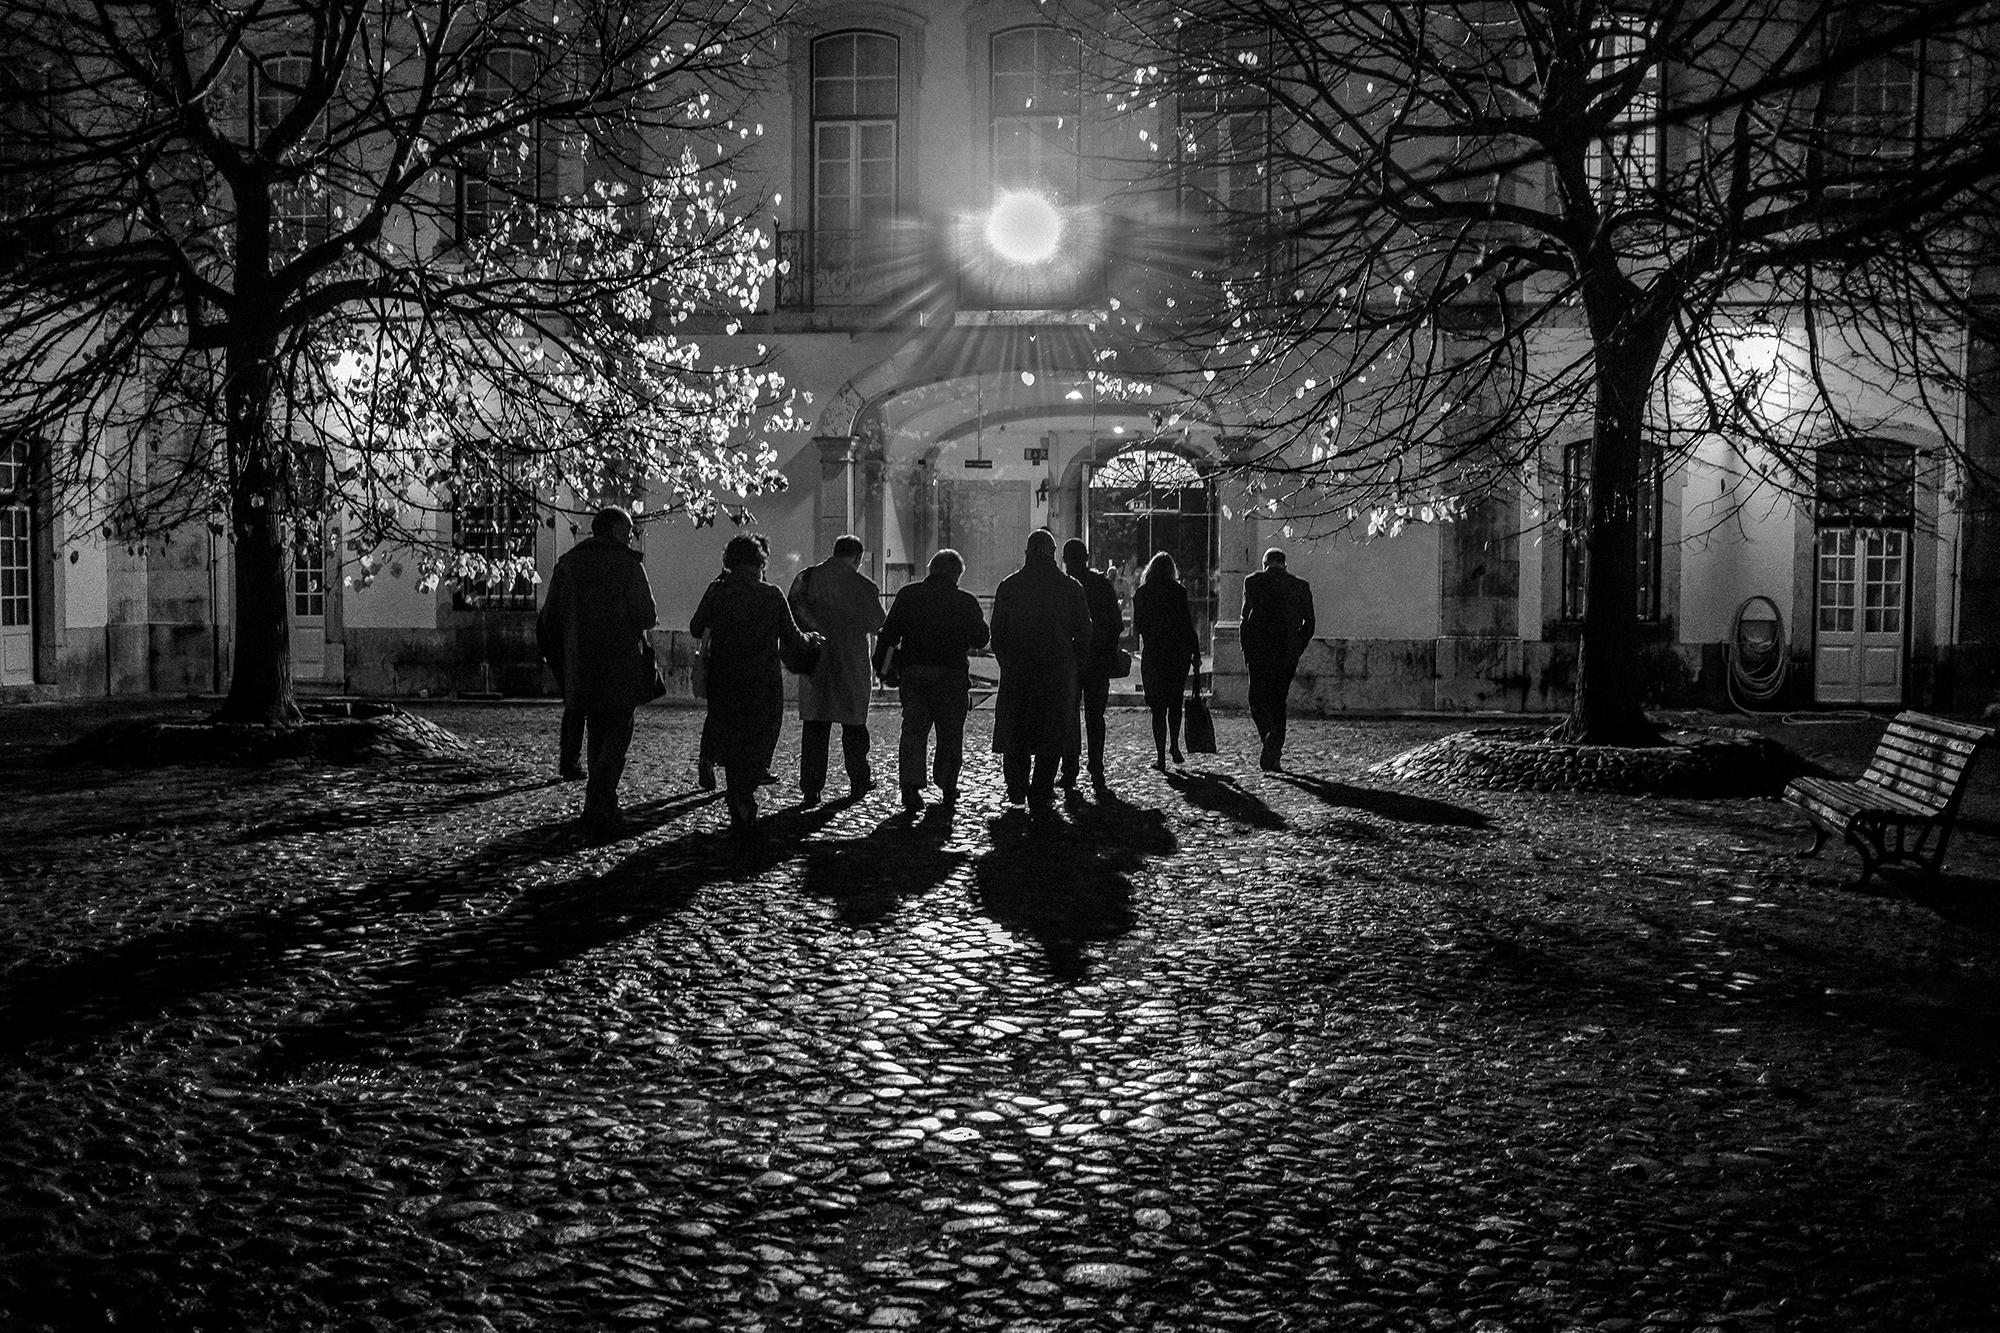 © Rodrigo Cabral Lisboa 2018